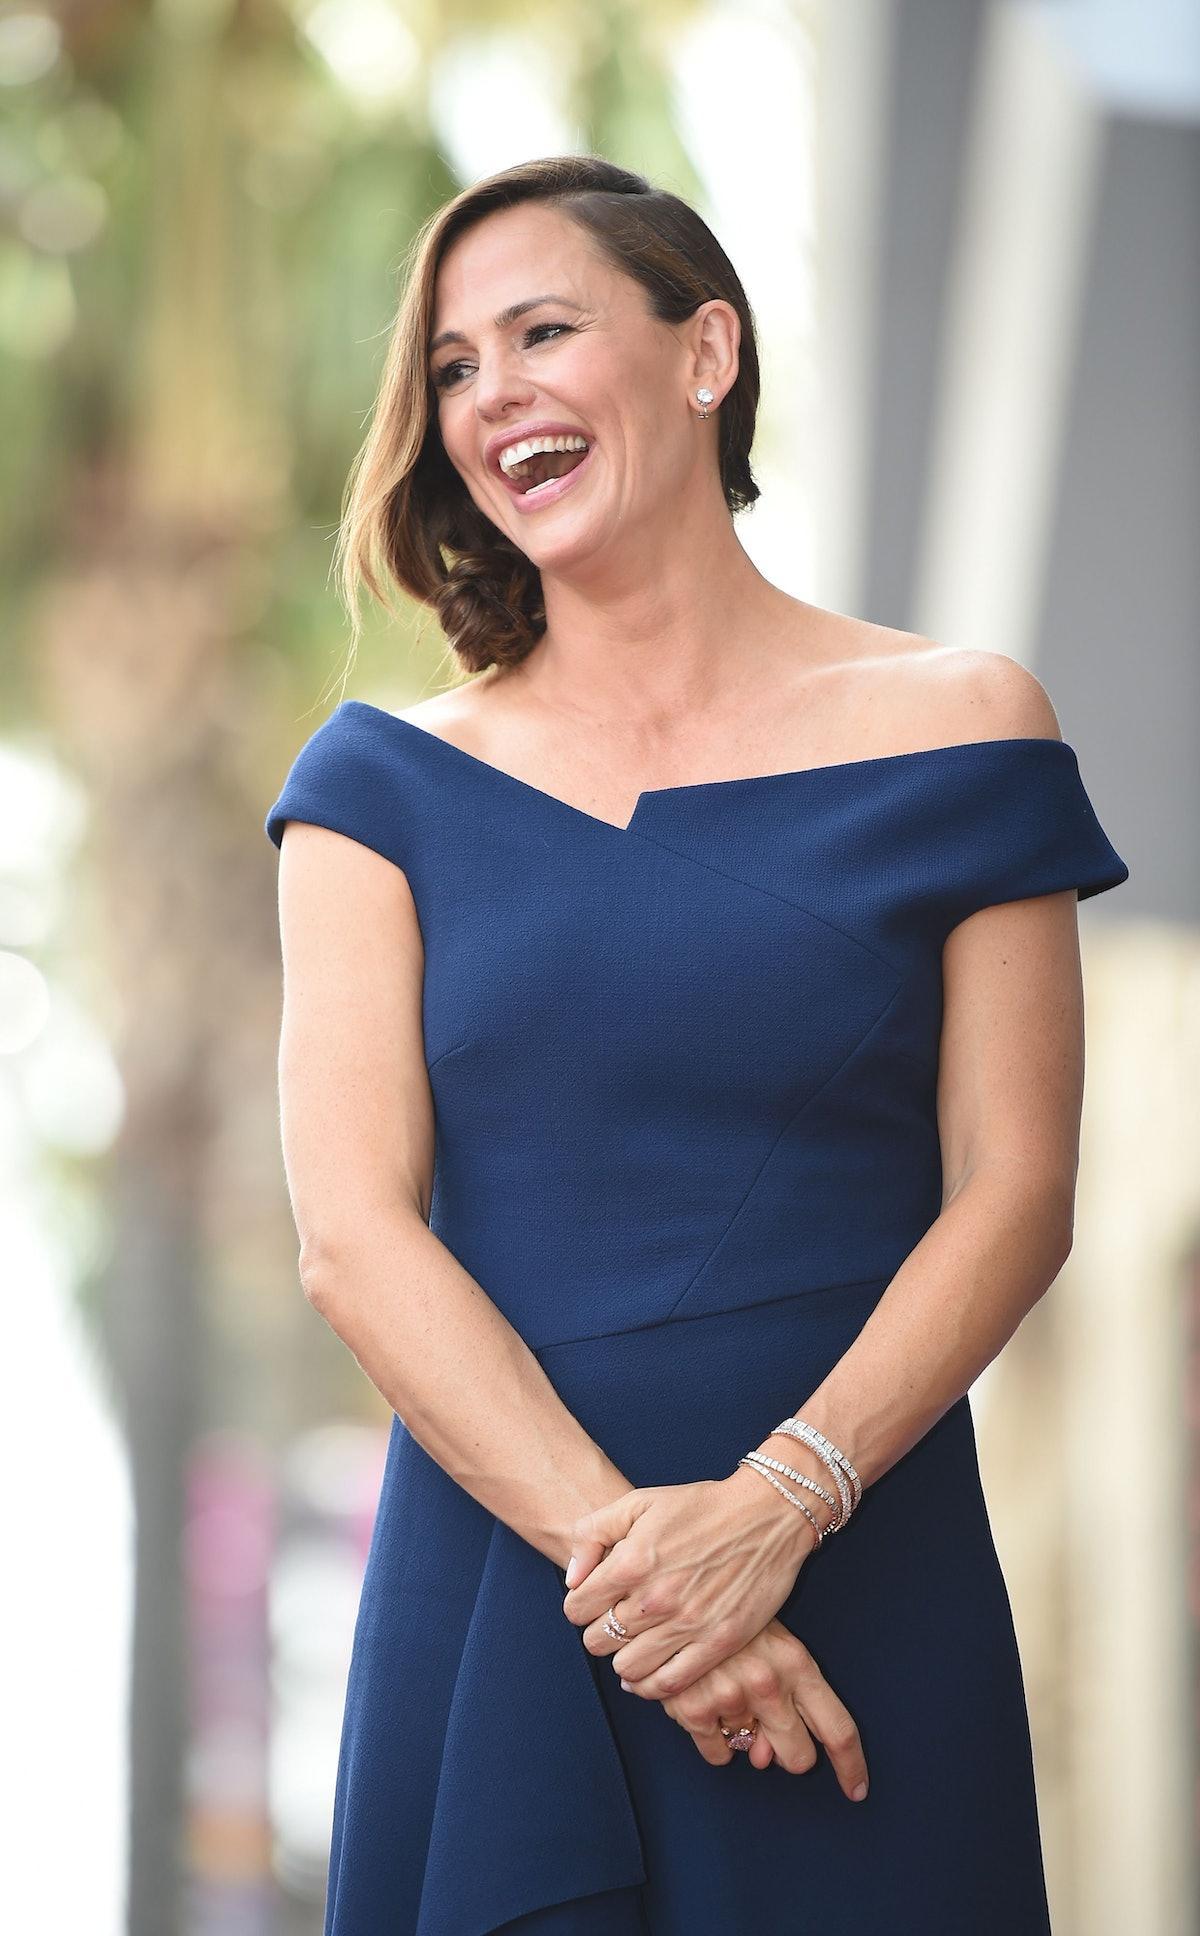 Jennifer Garner Wore the Exact Dress That Meghan Markle Wore 2